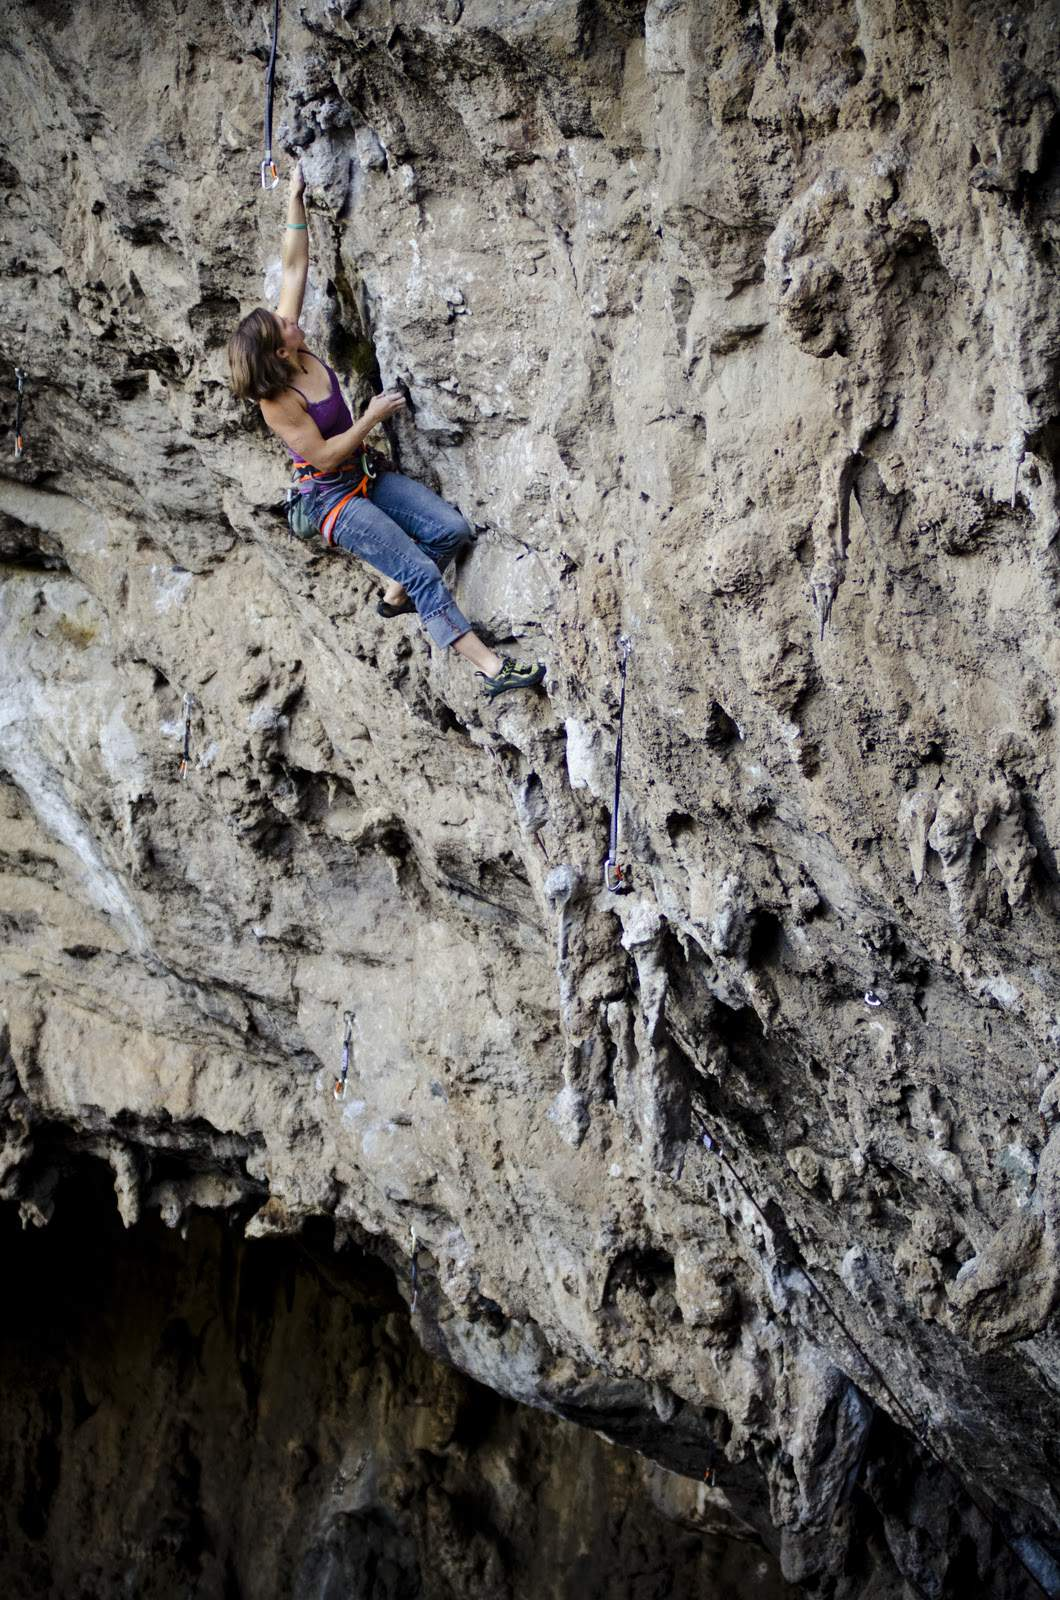 ClimbingGirls-28-WhitneyBolland-ElChonta-FotoDustinButcher